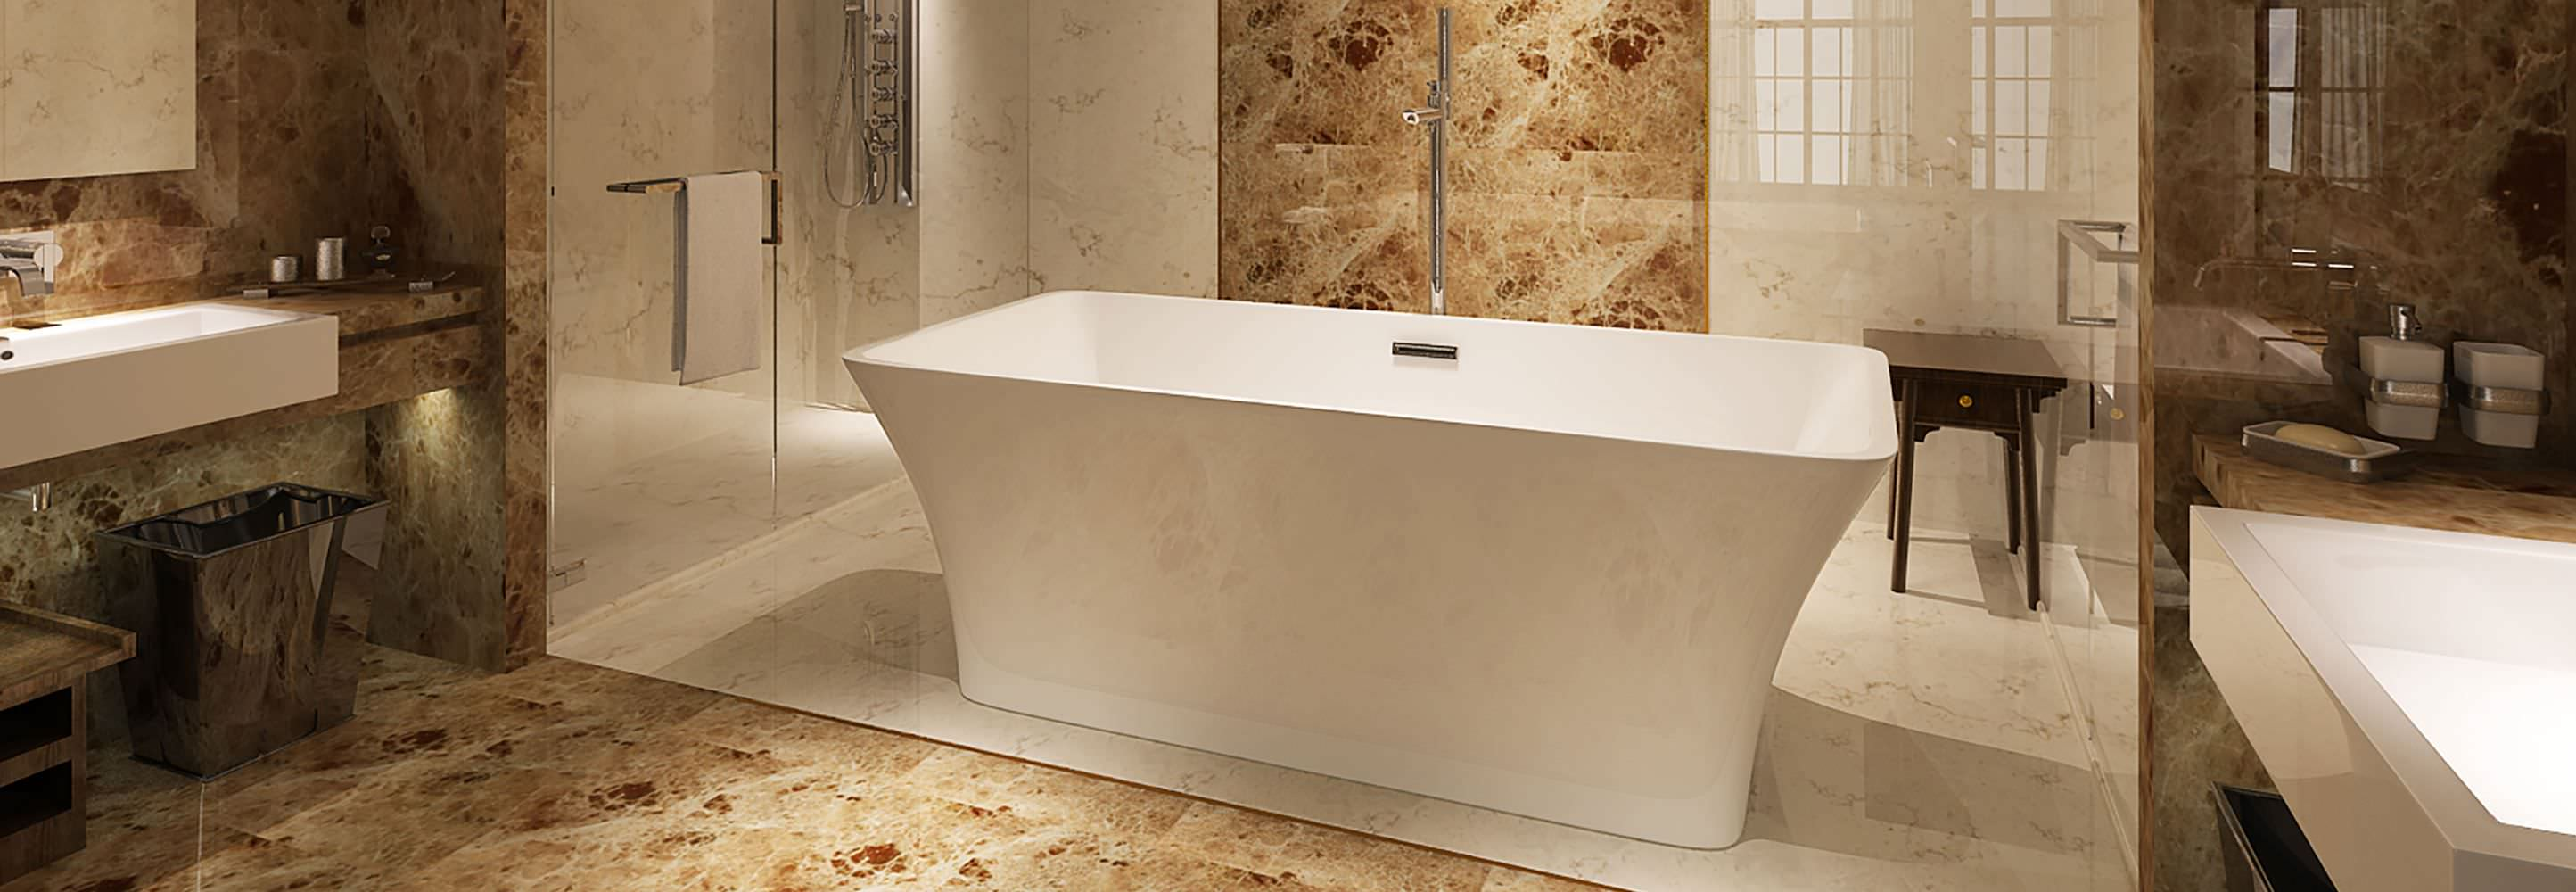 HelixBath Parva Freestanding Pedestal Modern Tub